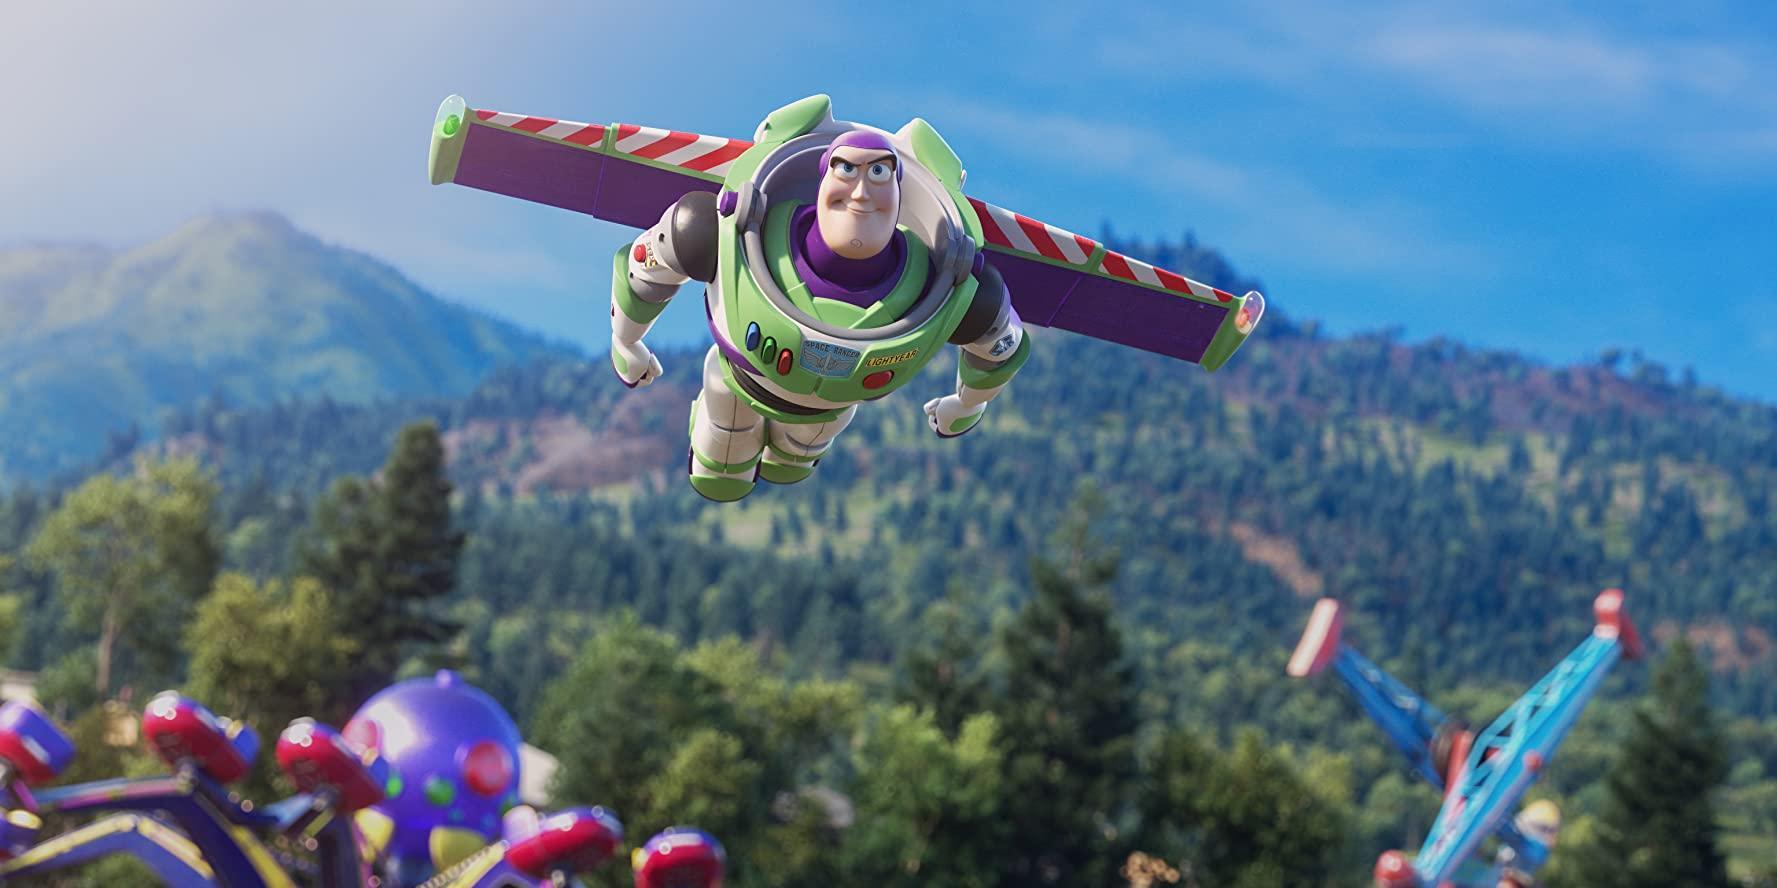 مشاهدة فيلم Toy Story 4 (2019) مترجم HD اون لاين